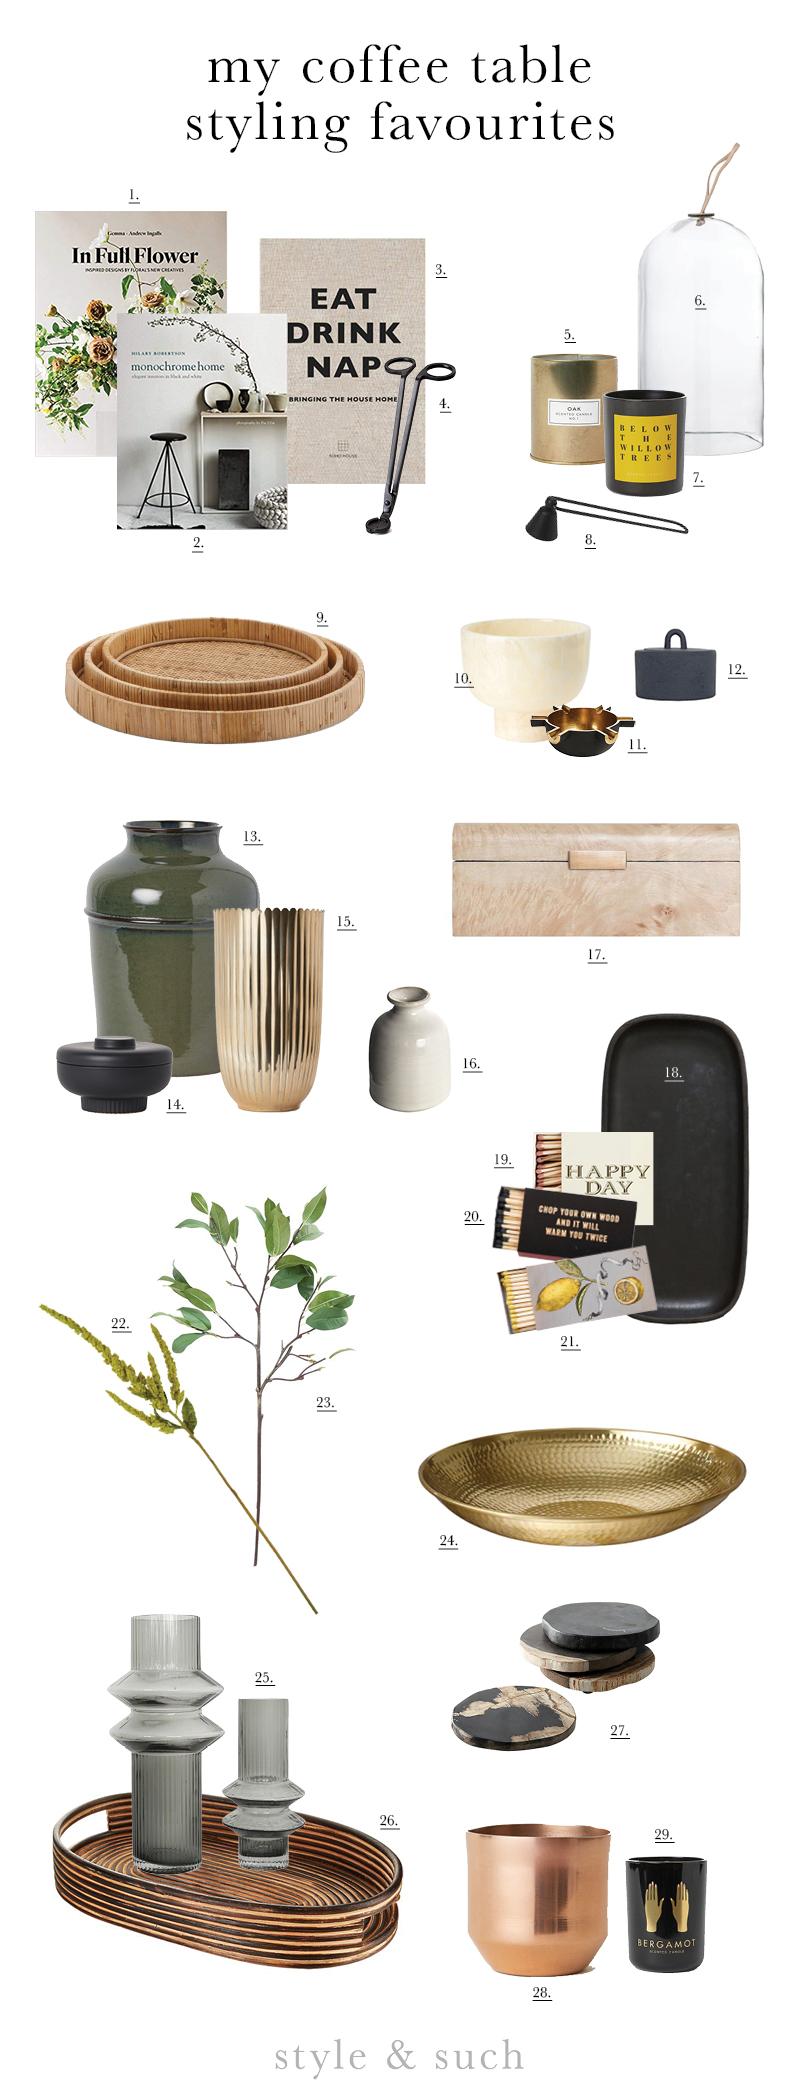 1.  In Full Flower  | 2.  Monochrome Home  | 3.  Eat Drink Nap  | 4.  Wick Trimmer  | 5.  Gold Candle  | 6.  Glass Cloche  | 7.  Willow Trees Candle  | 8.  Candle Snuffer  | 9.  Rattan Trays  | 10.  Marble Onyx Tealight Holder  | 11.  Spoke Tealight Holder  | 12.  Cast Iron Jar  | 13.  Large Earthware Vase  | 14.  Stoneware Jar  | 15.  Gold Vase  | 16.  Roald Mini Vase  | 17.  Burl Box  | 18.  Serpentine Tray  | 19.  Happy Day Match Box  | 20.  Lumberjack Match Box  | 21.  Lemons Matchbox  | 22.  Faux Amaranthus Stem  | 23.  Faux Laurel Stem  | 24.  Gold Bowl  | 25.  Rorik Vases  | 26.  Rattan Serving Tray  | 27.  Petrified Wood Coasters  | 28.  Copper Plant Pot  | 29.  Bergamot Candle